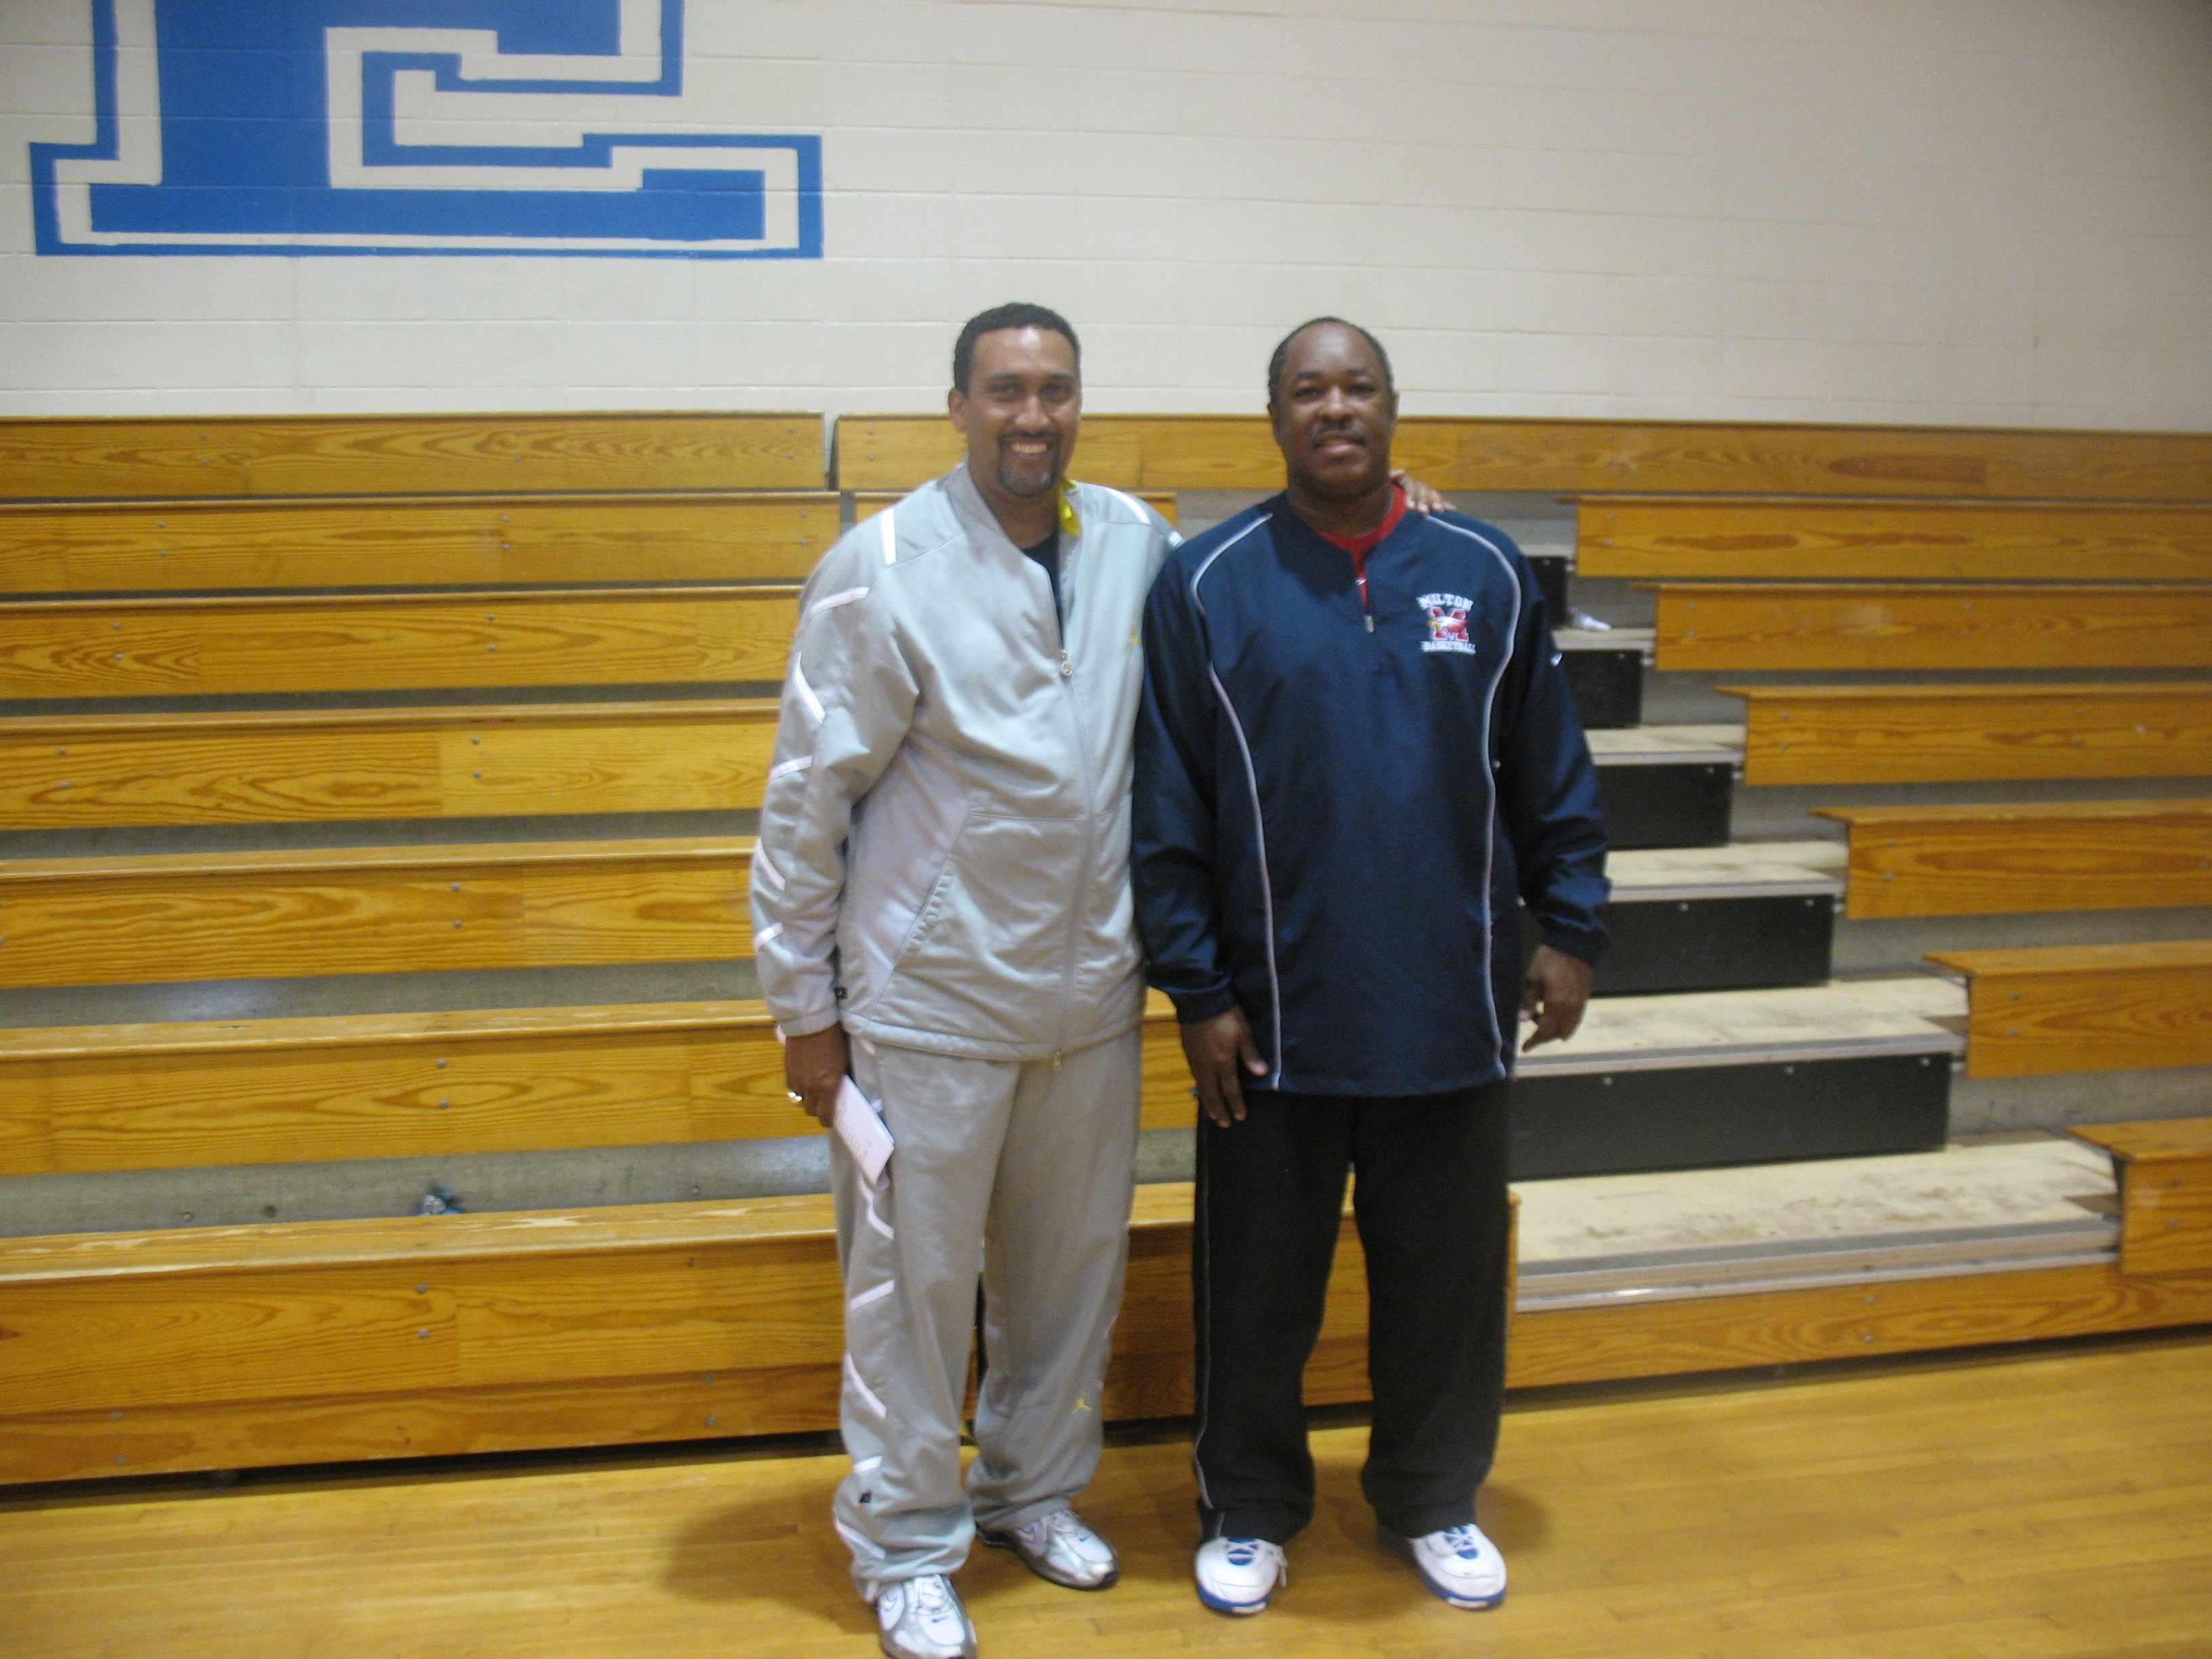 Coach E and Coach D